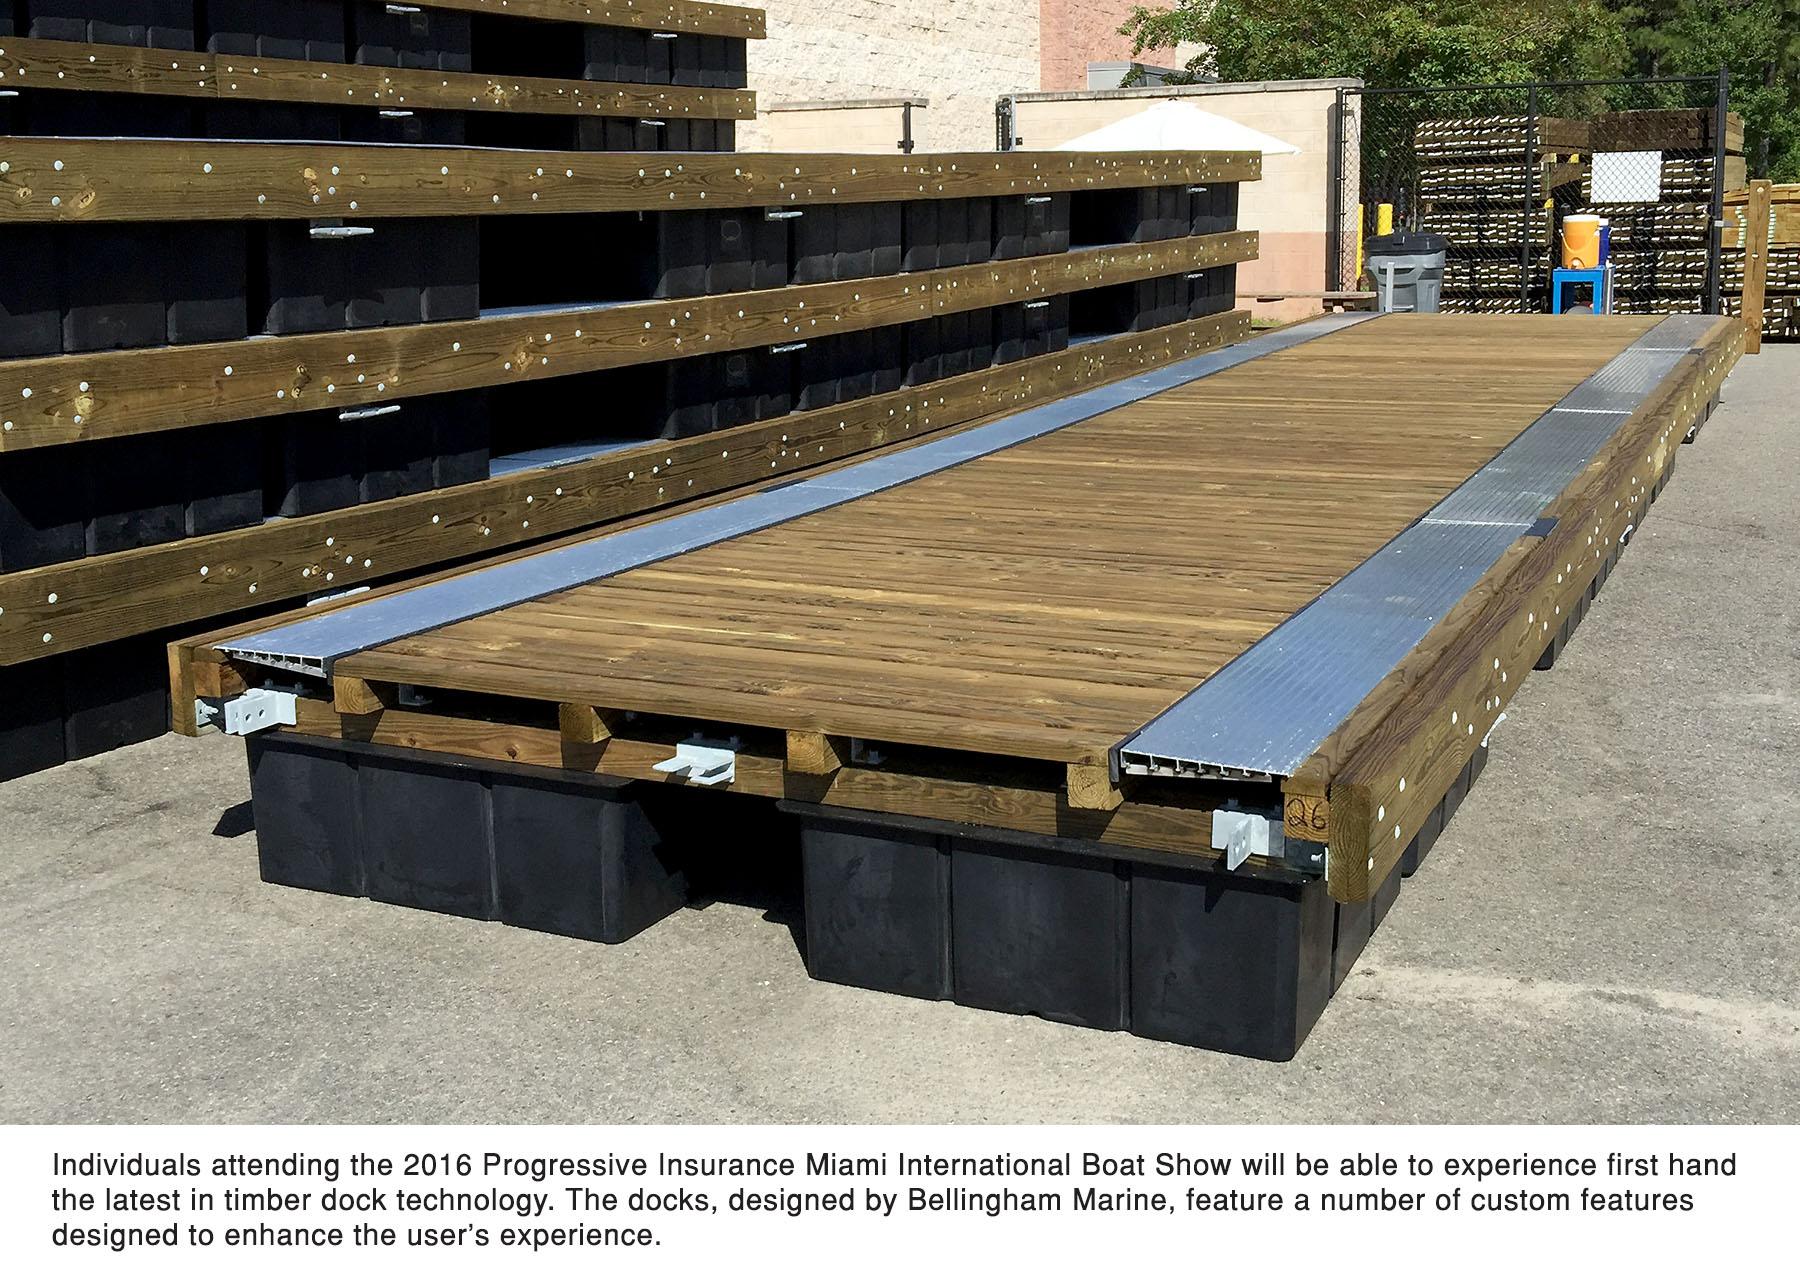 Bellingham Marine designed a custom wood dock for the Miami International Boat Show